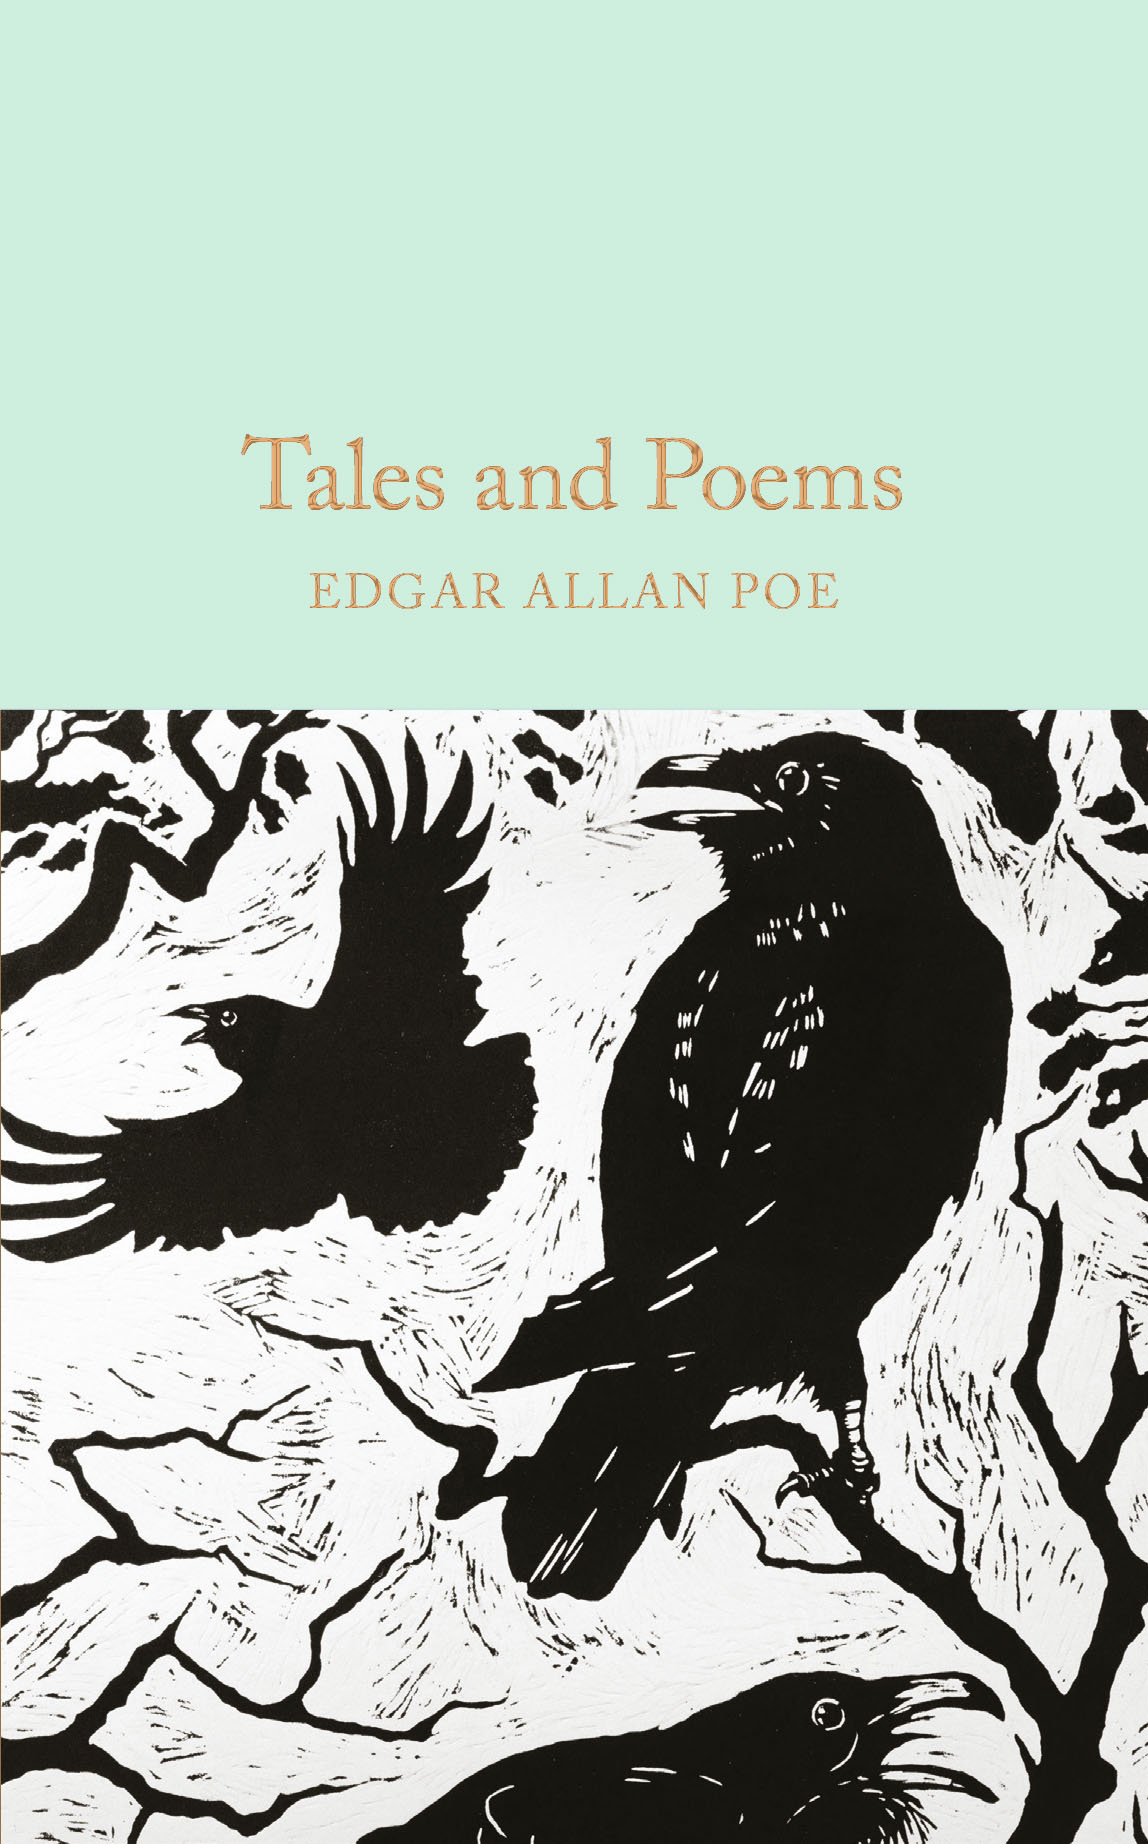 Tales and Poems poe e a the best of edgar allan poe vol 2 эдгар аллан по избранное кн на англ яз